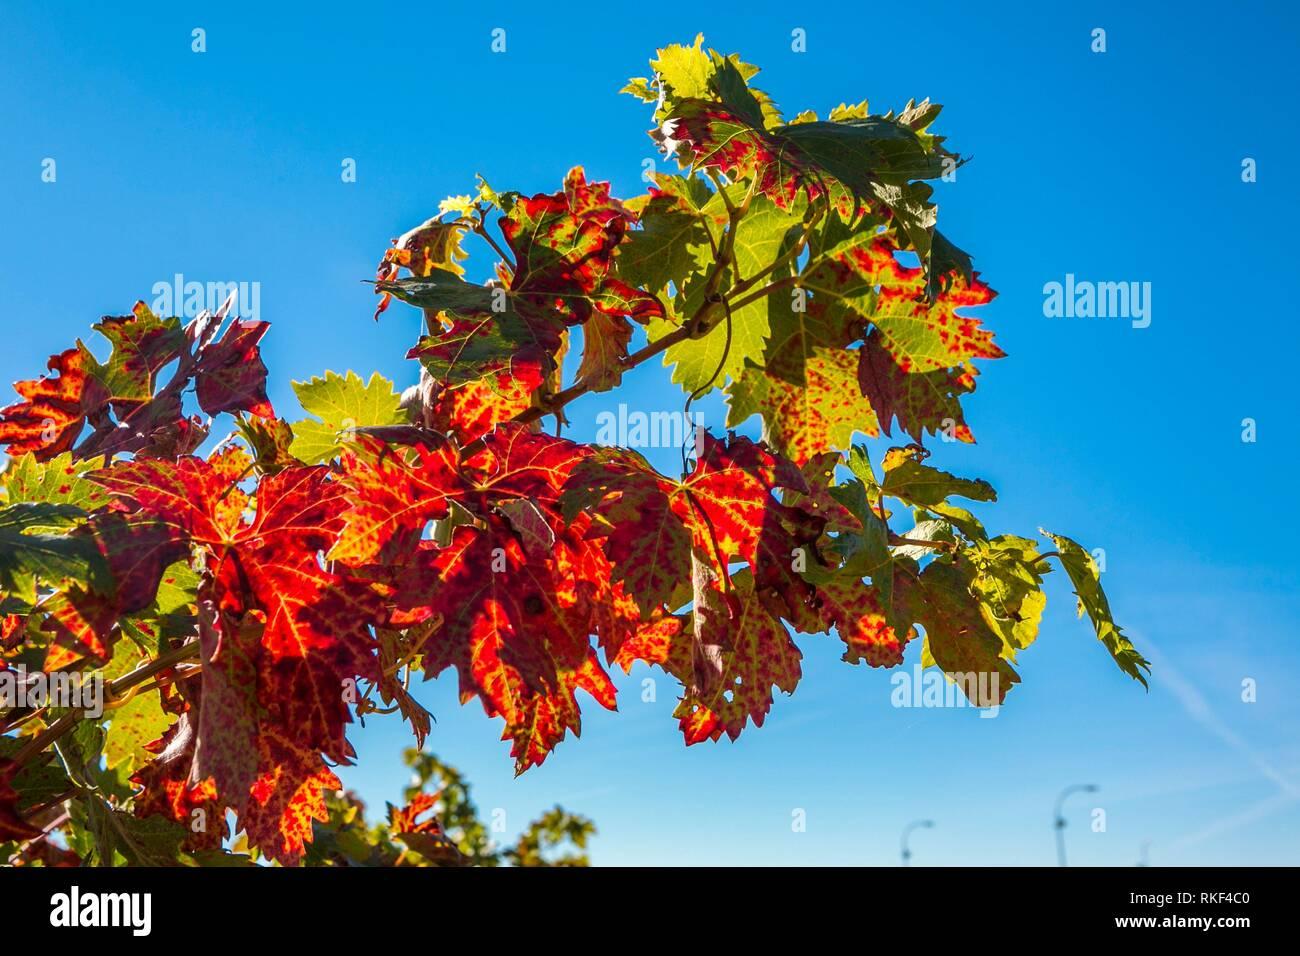 Autumn in the Vineyards of Gomez Cruzado Wine Cellars. Haro. La Rioja. Spain - Stock Image